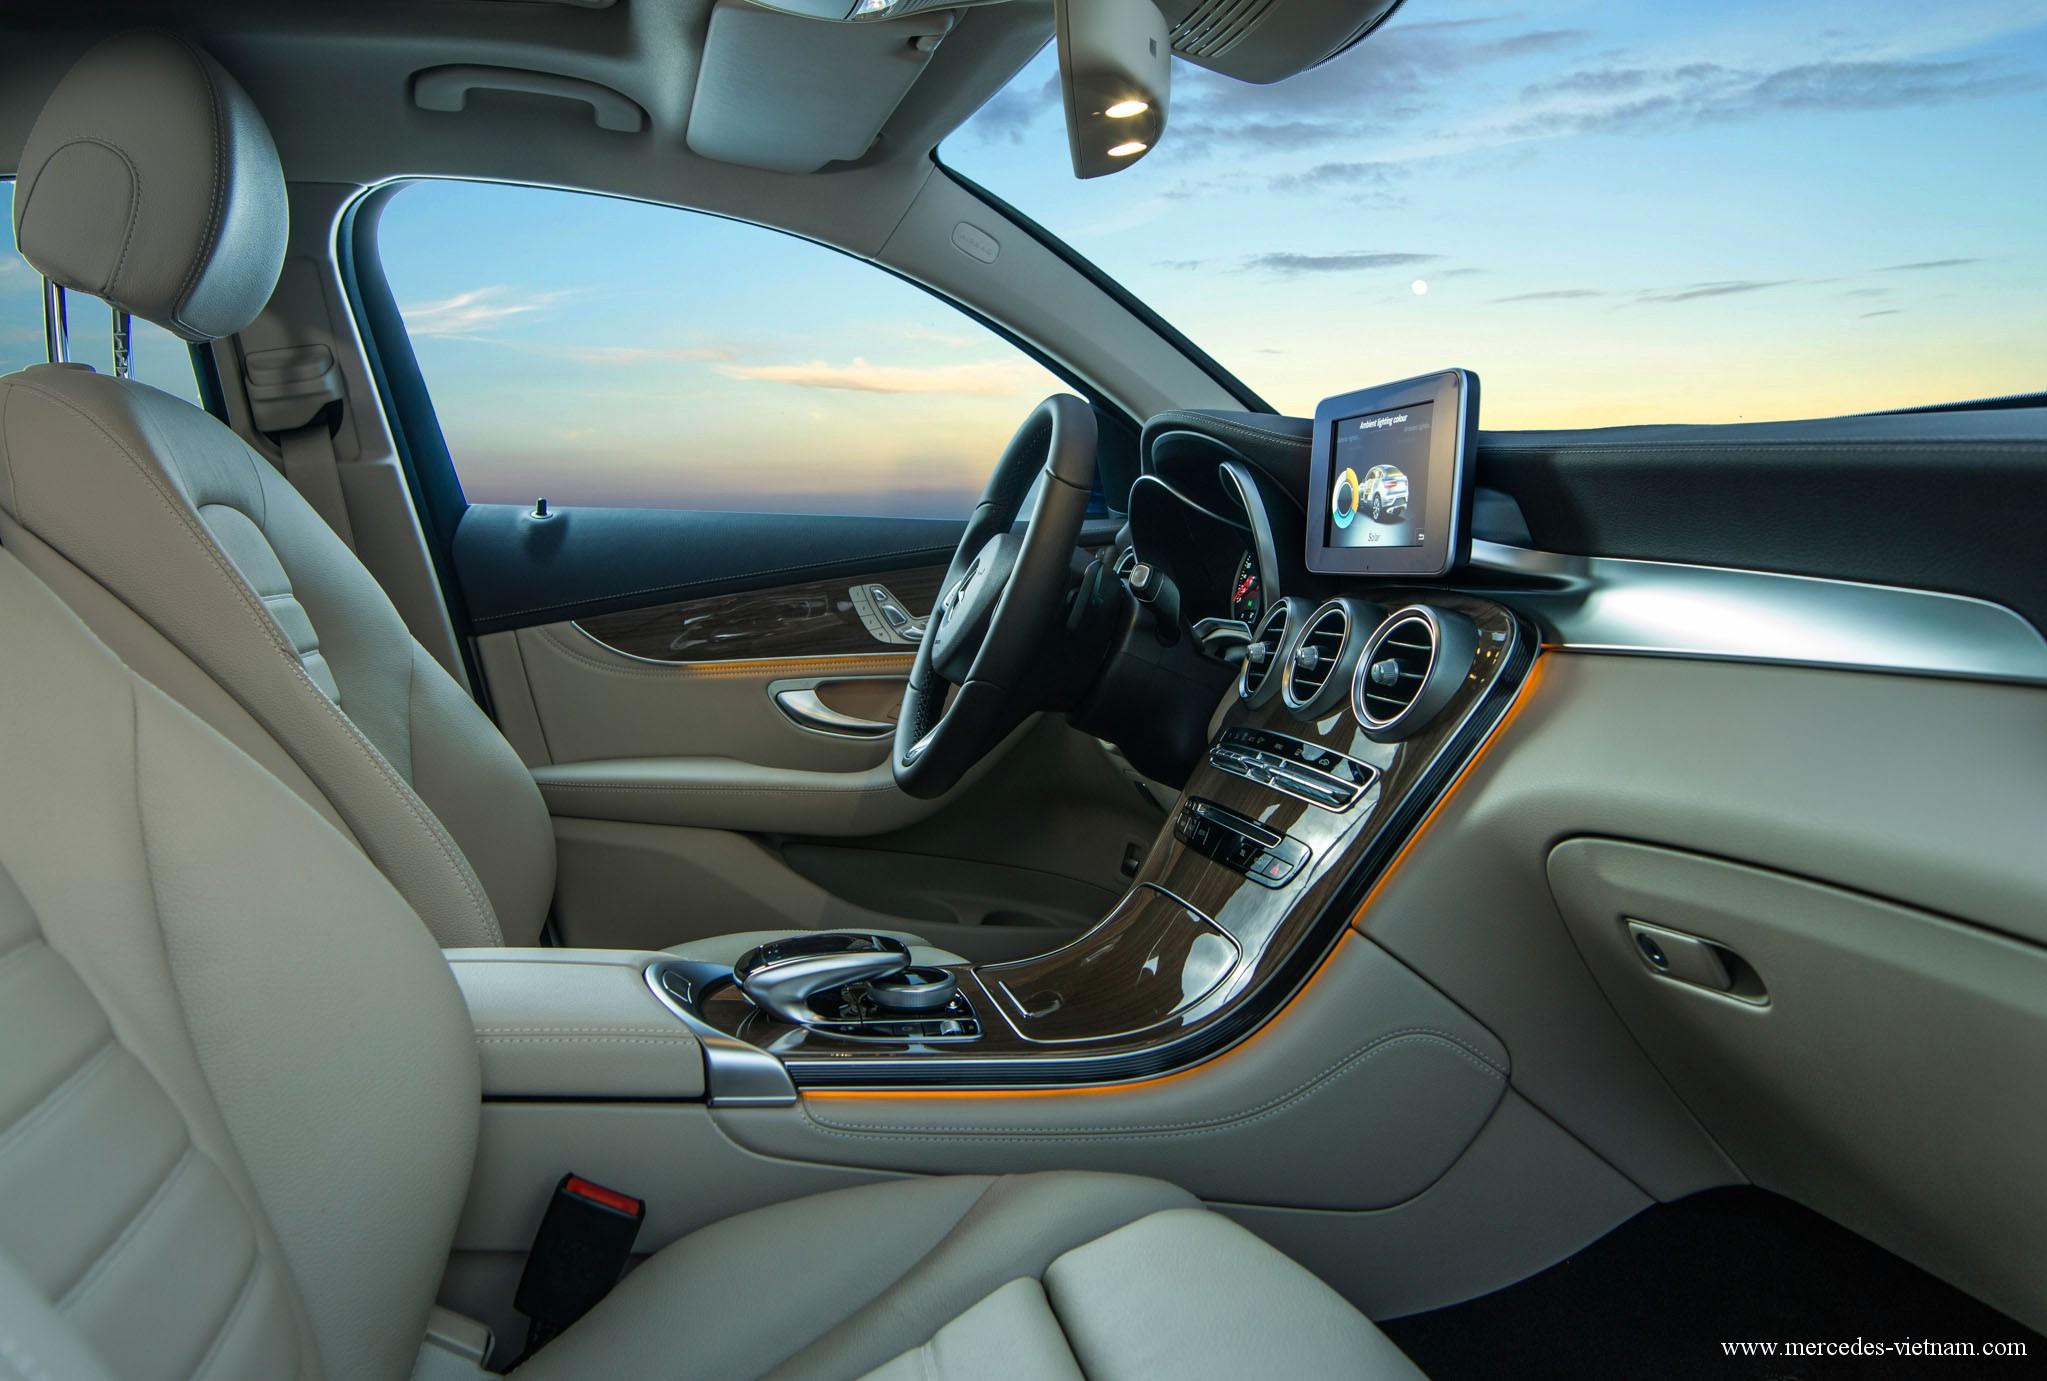 Giá xe Mercedes GLC 300 Coupe 2018 4Matic nhập khẩu tốt nhất